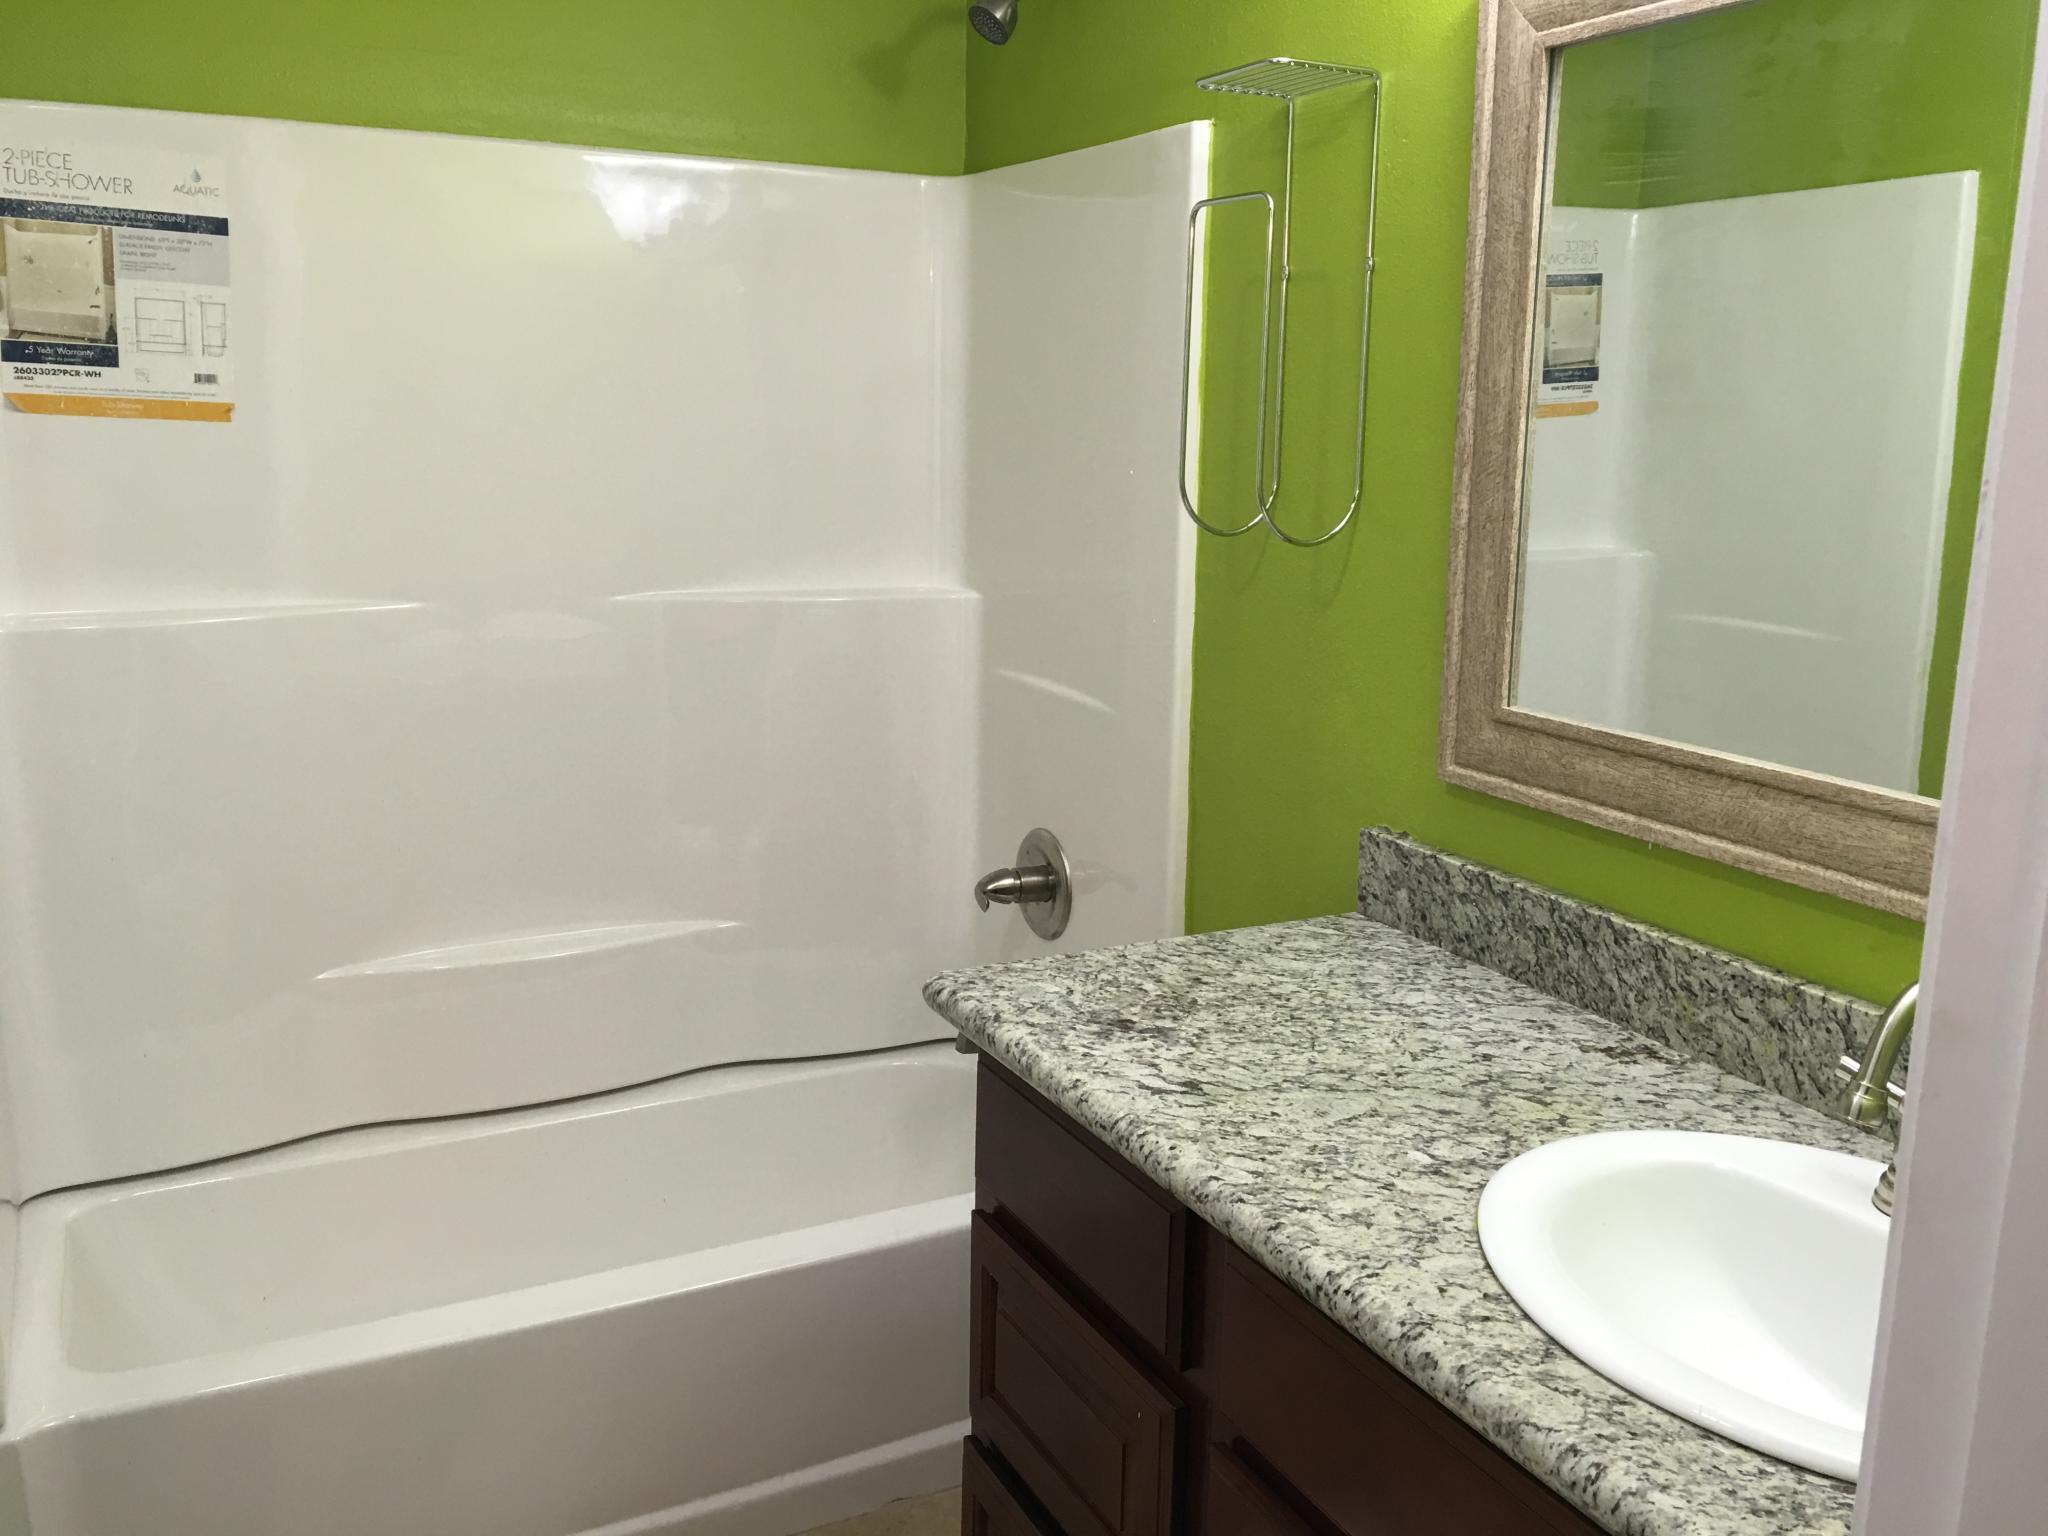 1123 Marigny St For Rent - New Orleans, LA | Trulia